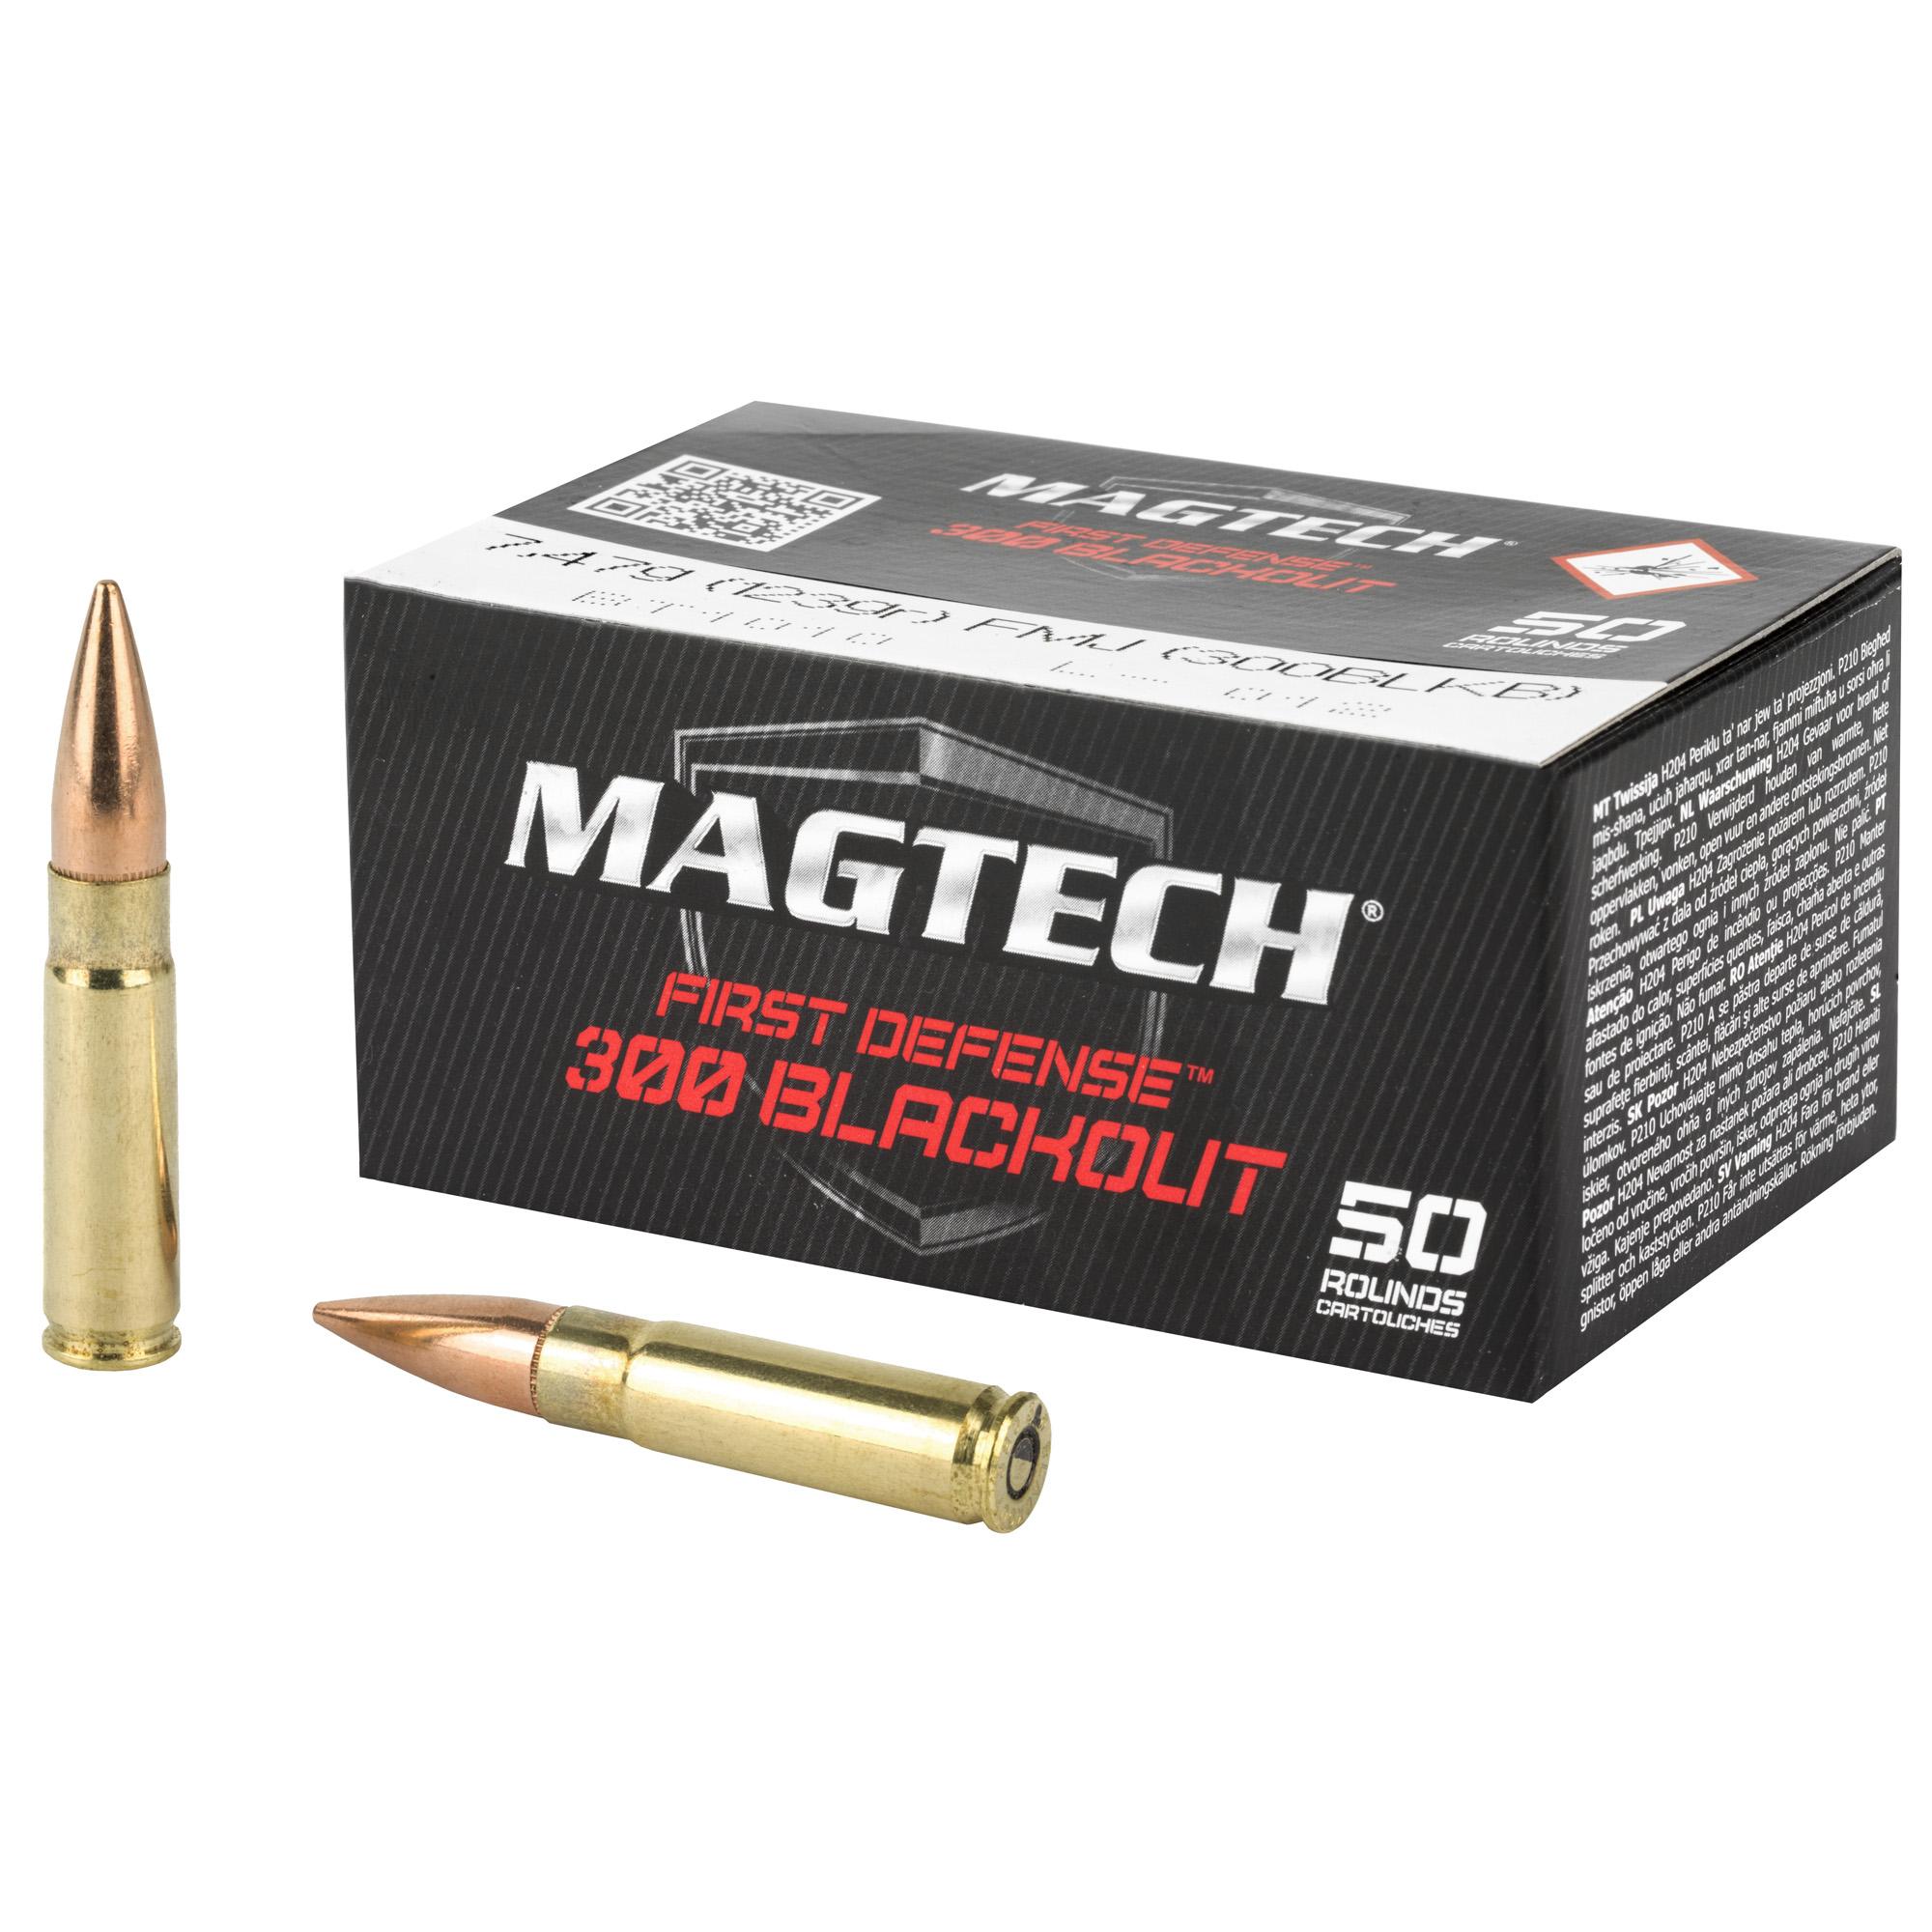 Magtech 300BLKB Tactical/Training 300 Blackout 123 gr Full Metal Jacket (FMJ) 50 Bx